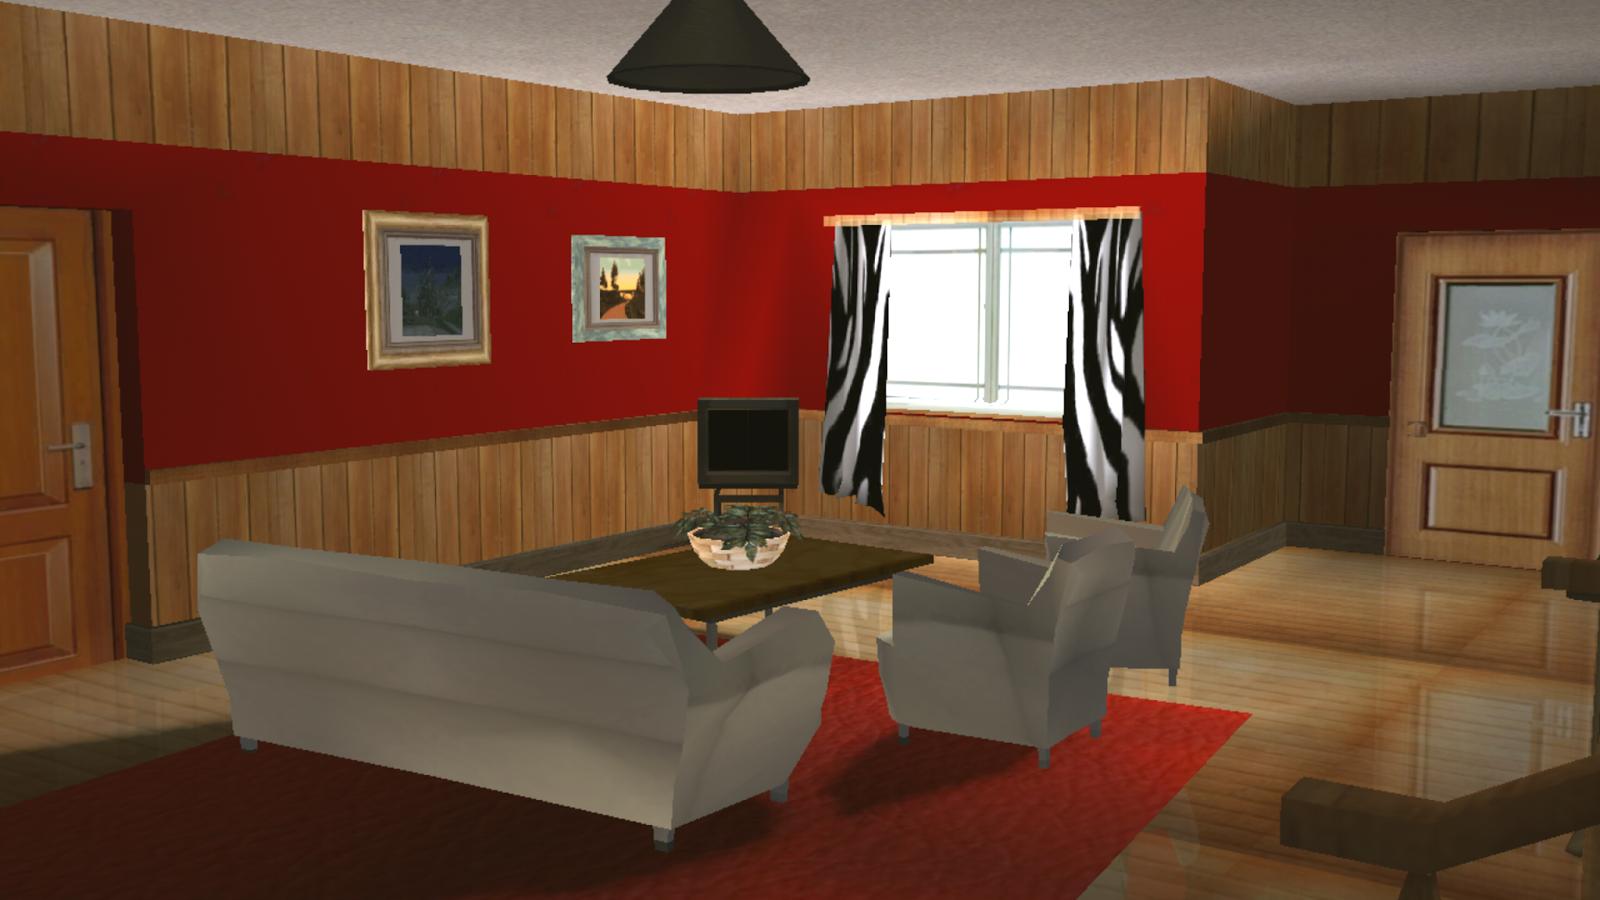 Modern House (CJ) Mod - GTA SA